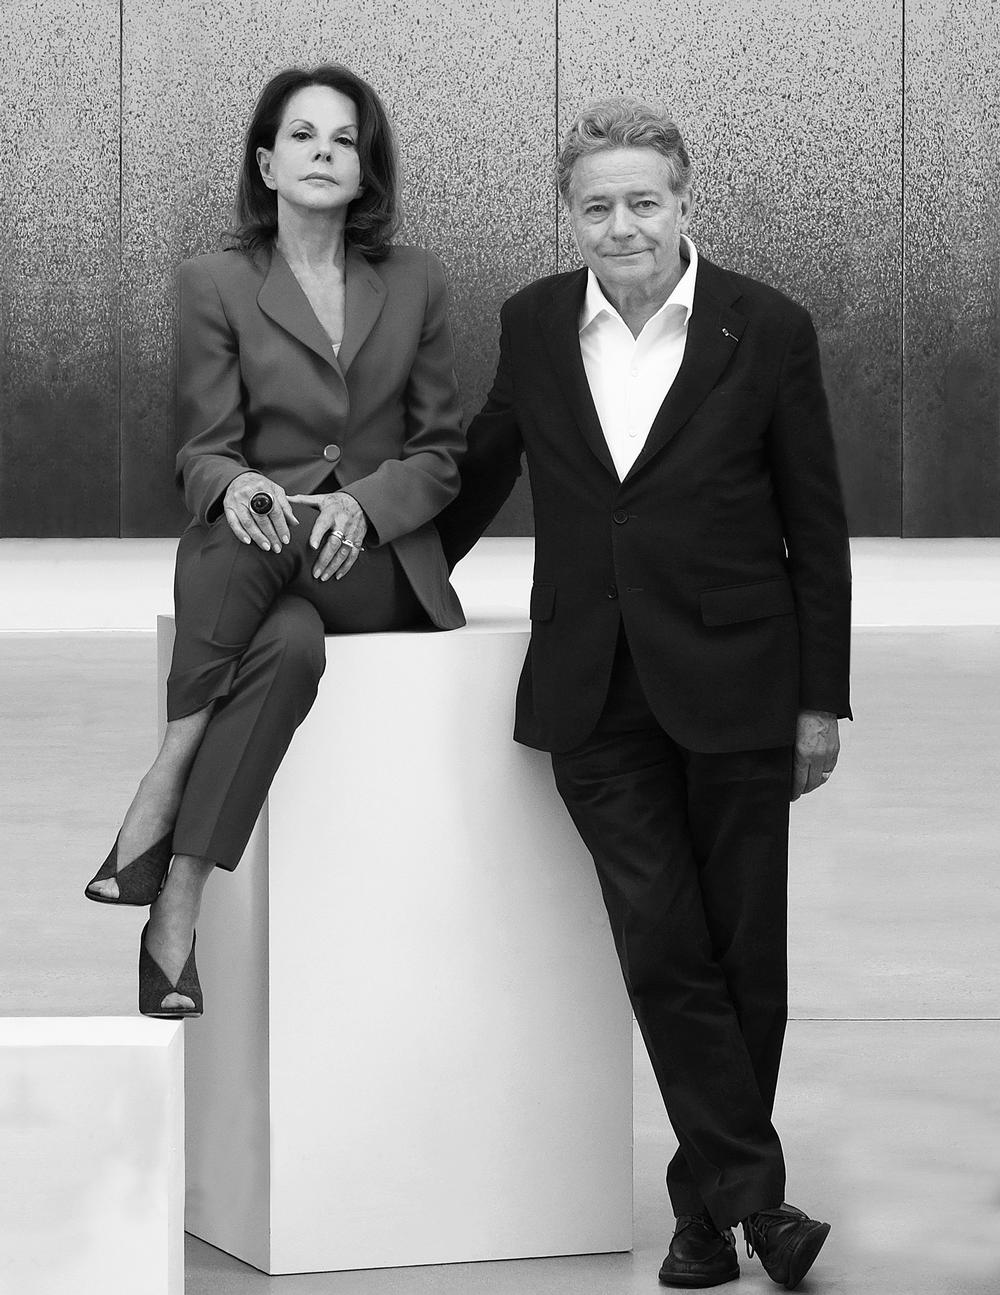 Elizabeth and Christian de Portzamparc launched 2Portzamparc together / Photo: ©Zoltan Alexander of Zoltan + Media